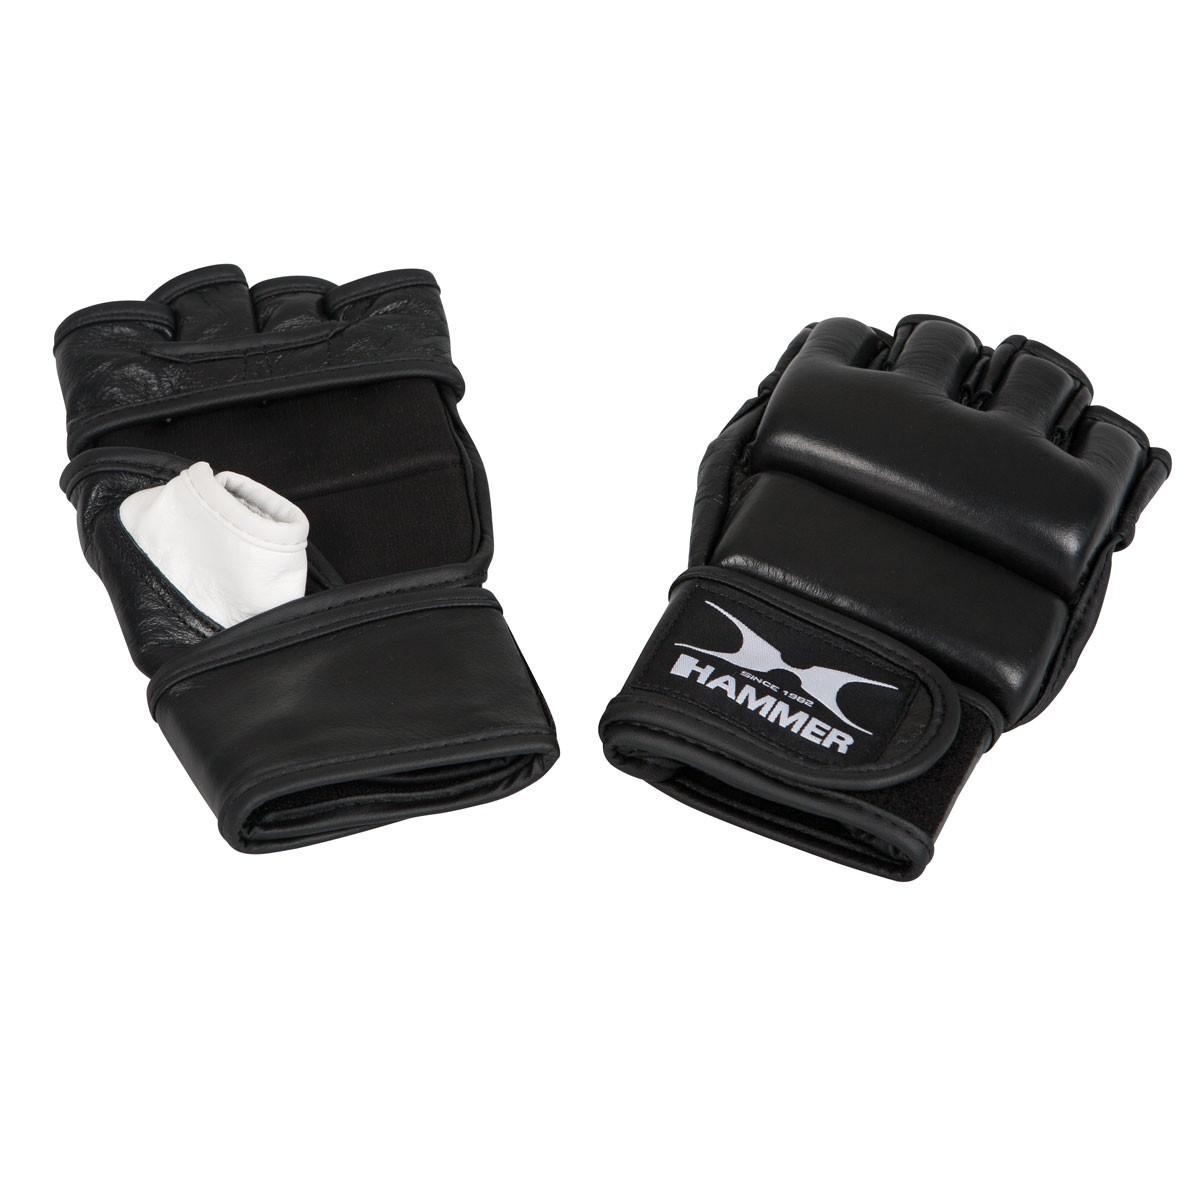 Black hammer gloves - Hammer Boxing Boxing Gloves Mma Fight